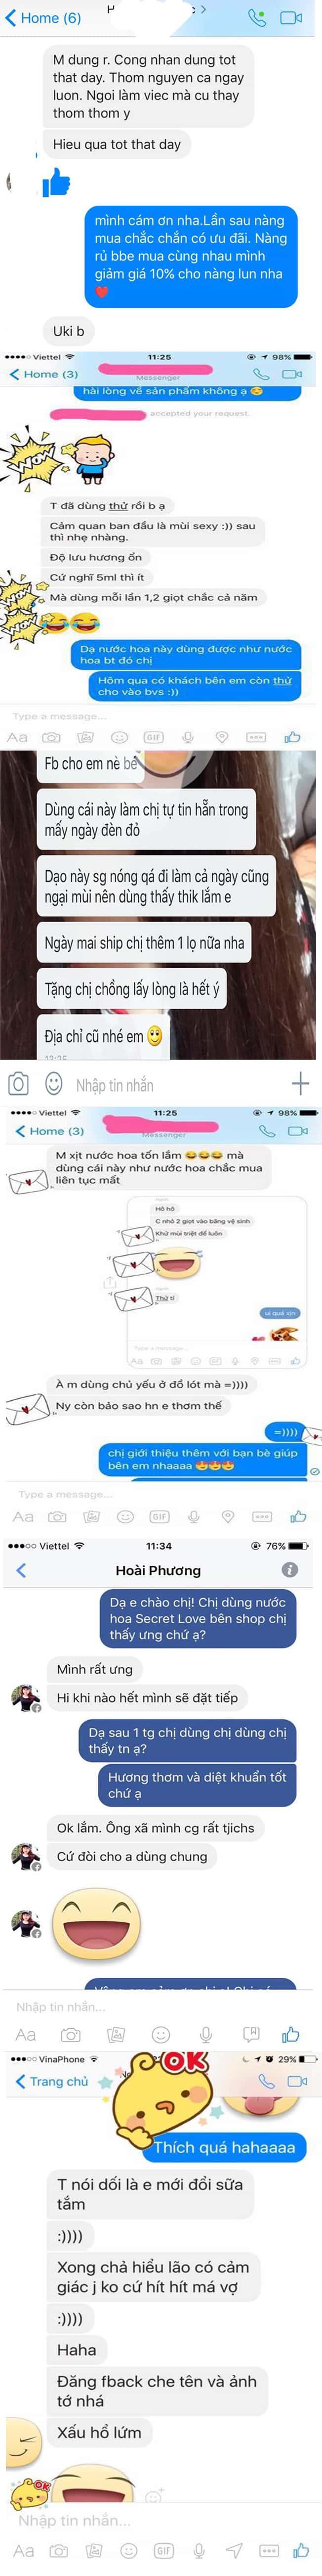 nuoc-hoa-vung-kin-dionel-secret-love -danh-gia1